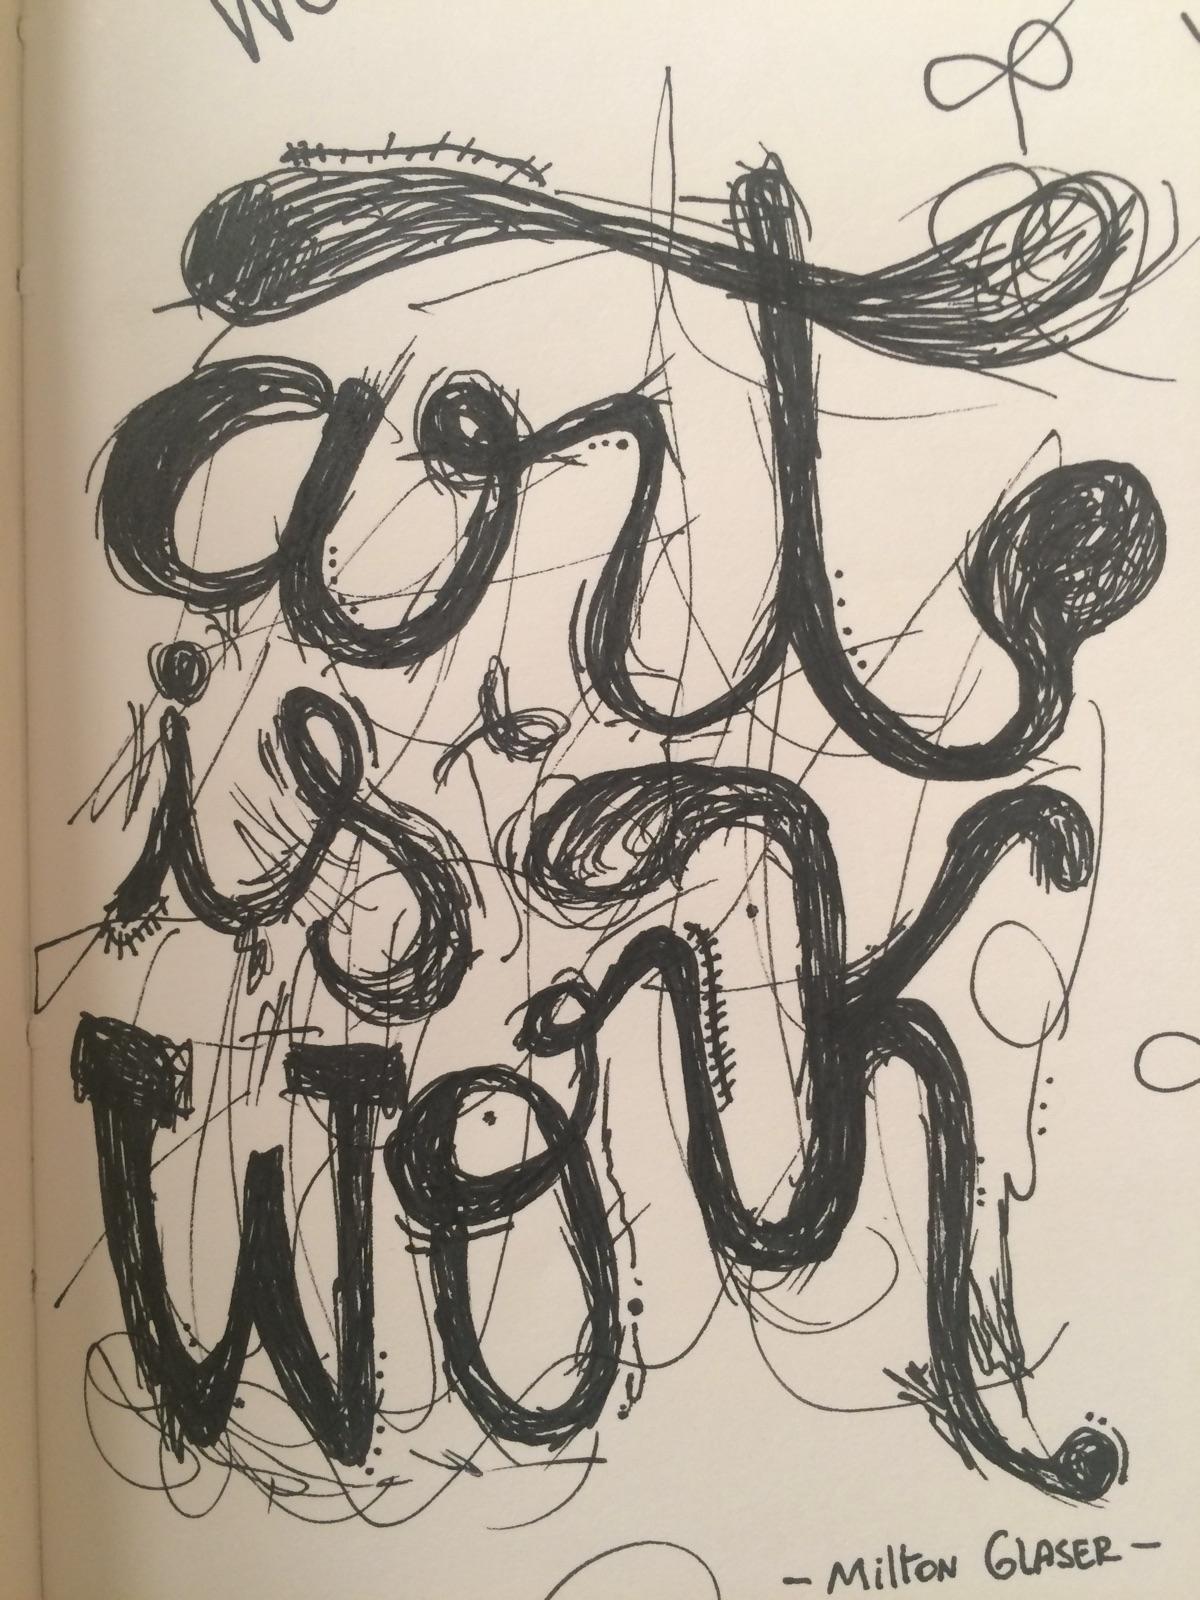 quote Milton Glaser. - Art work - kevincarrera | ello